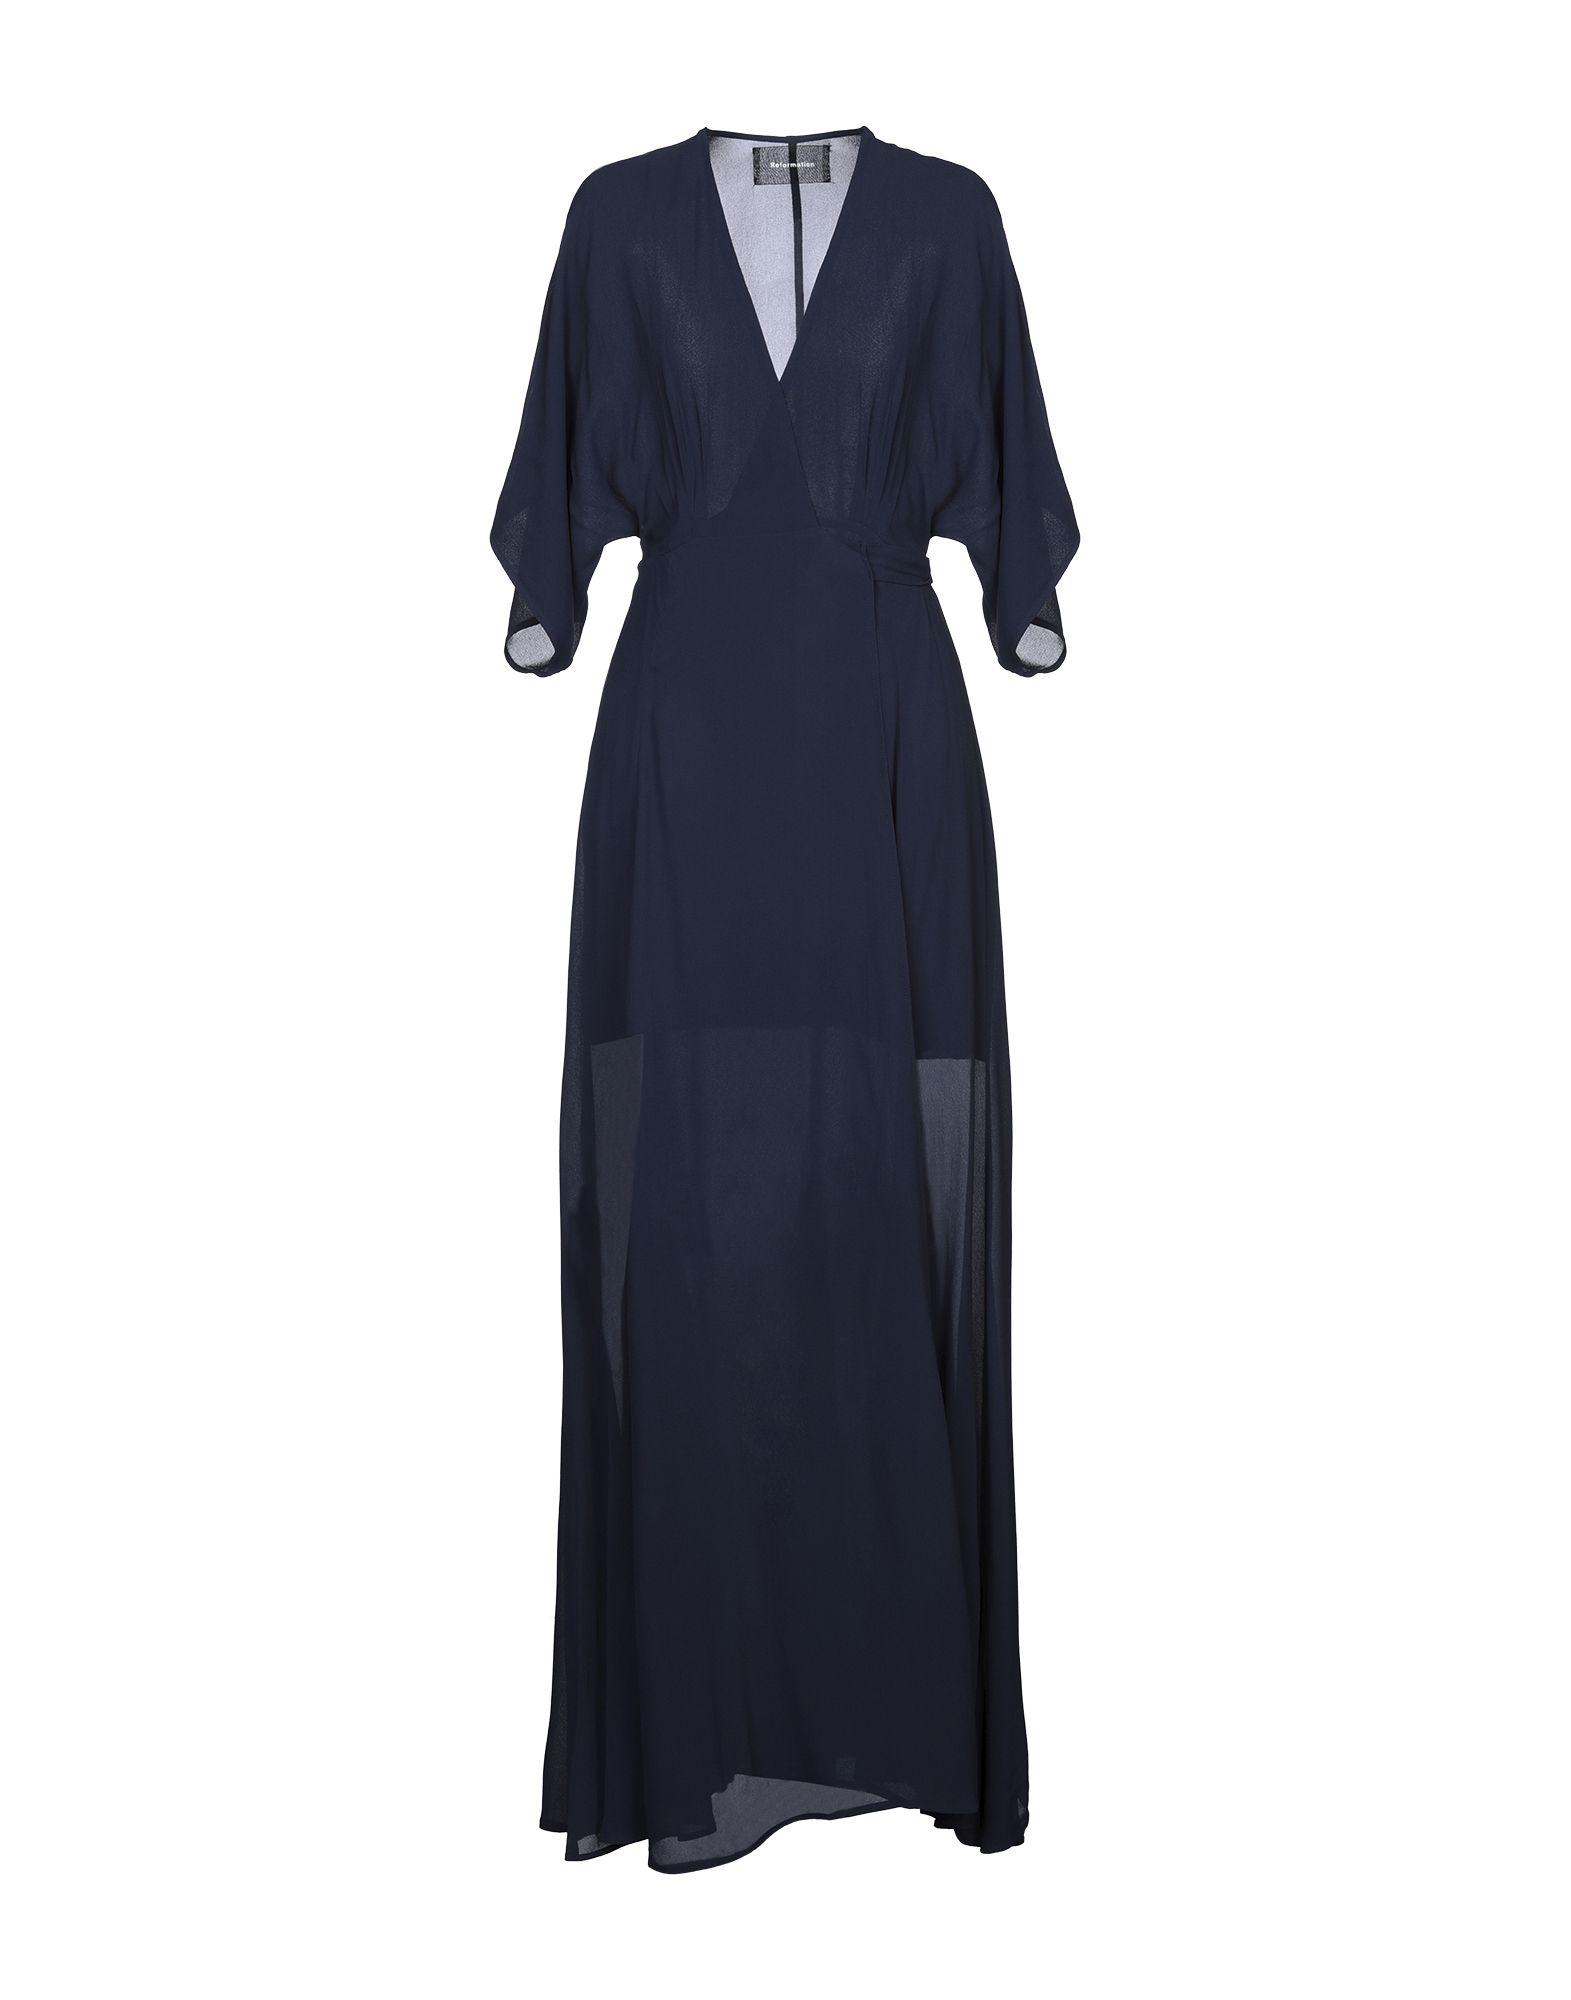 REFORMATION Long dresses. crepe, no appliqués, basic solid color, deep neckline, short sleeves, no pockets, self-tie wrap closure, unlined. 100% Viscose